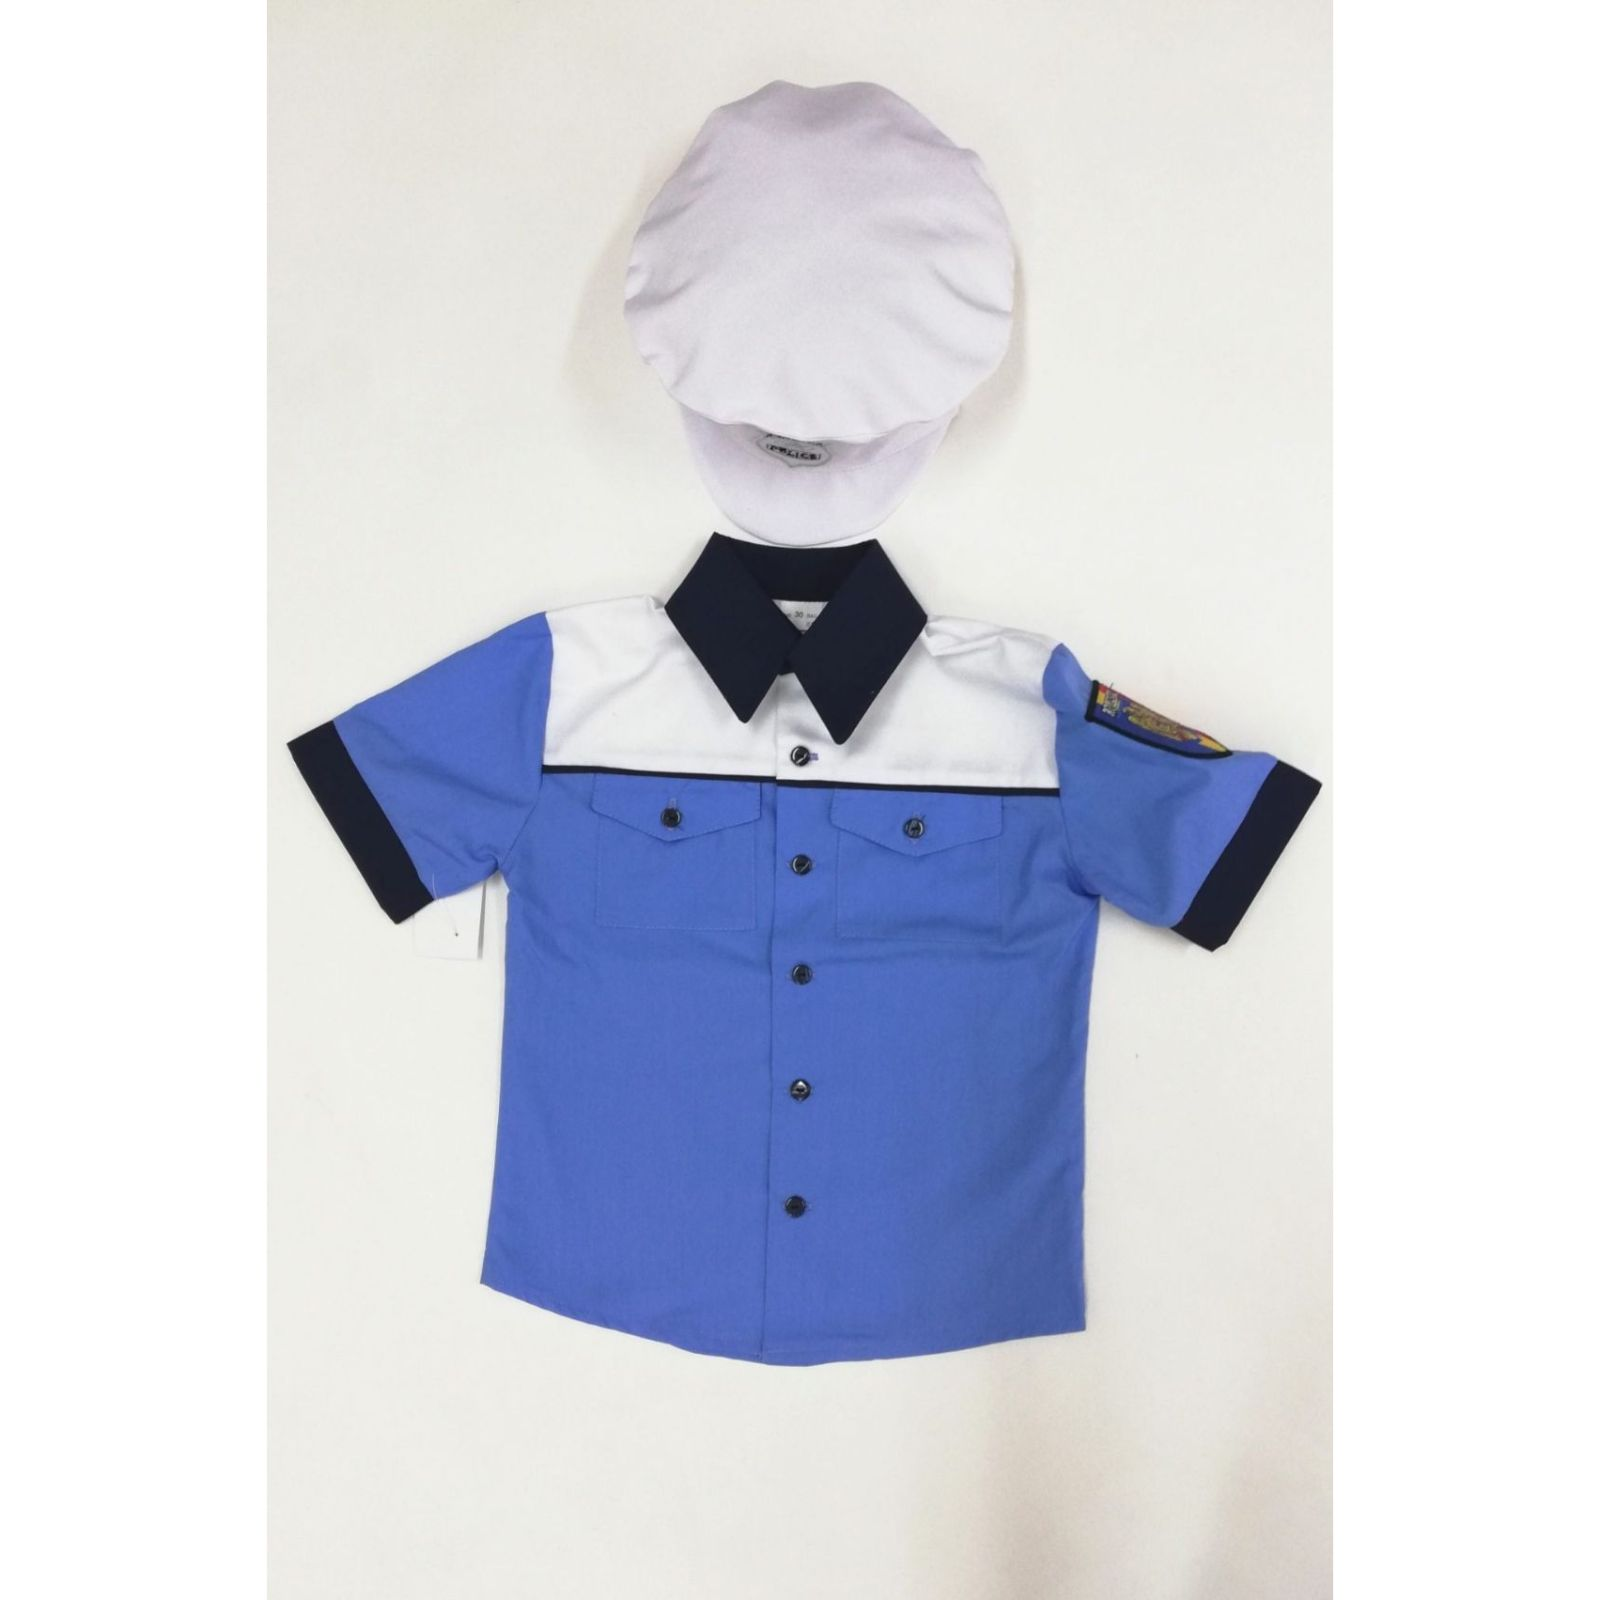 Costum polițist copii- standard 2